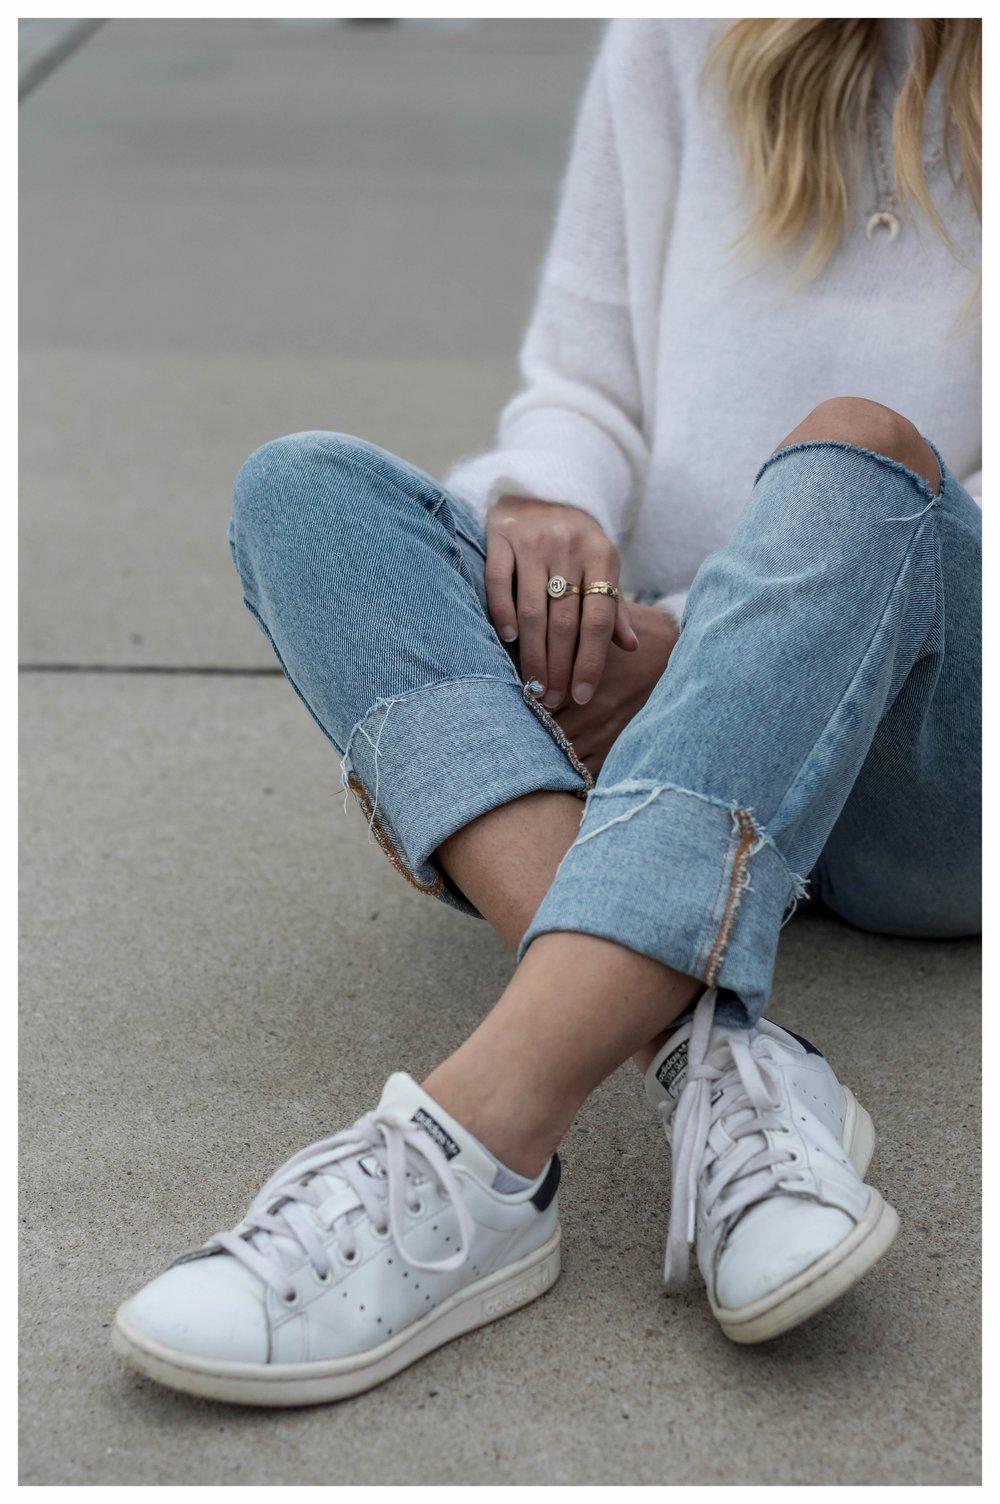 High Jeans - OSIARAH.COM (12 sur 21).jpg